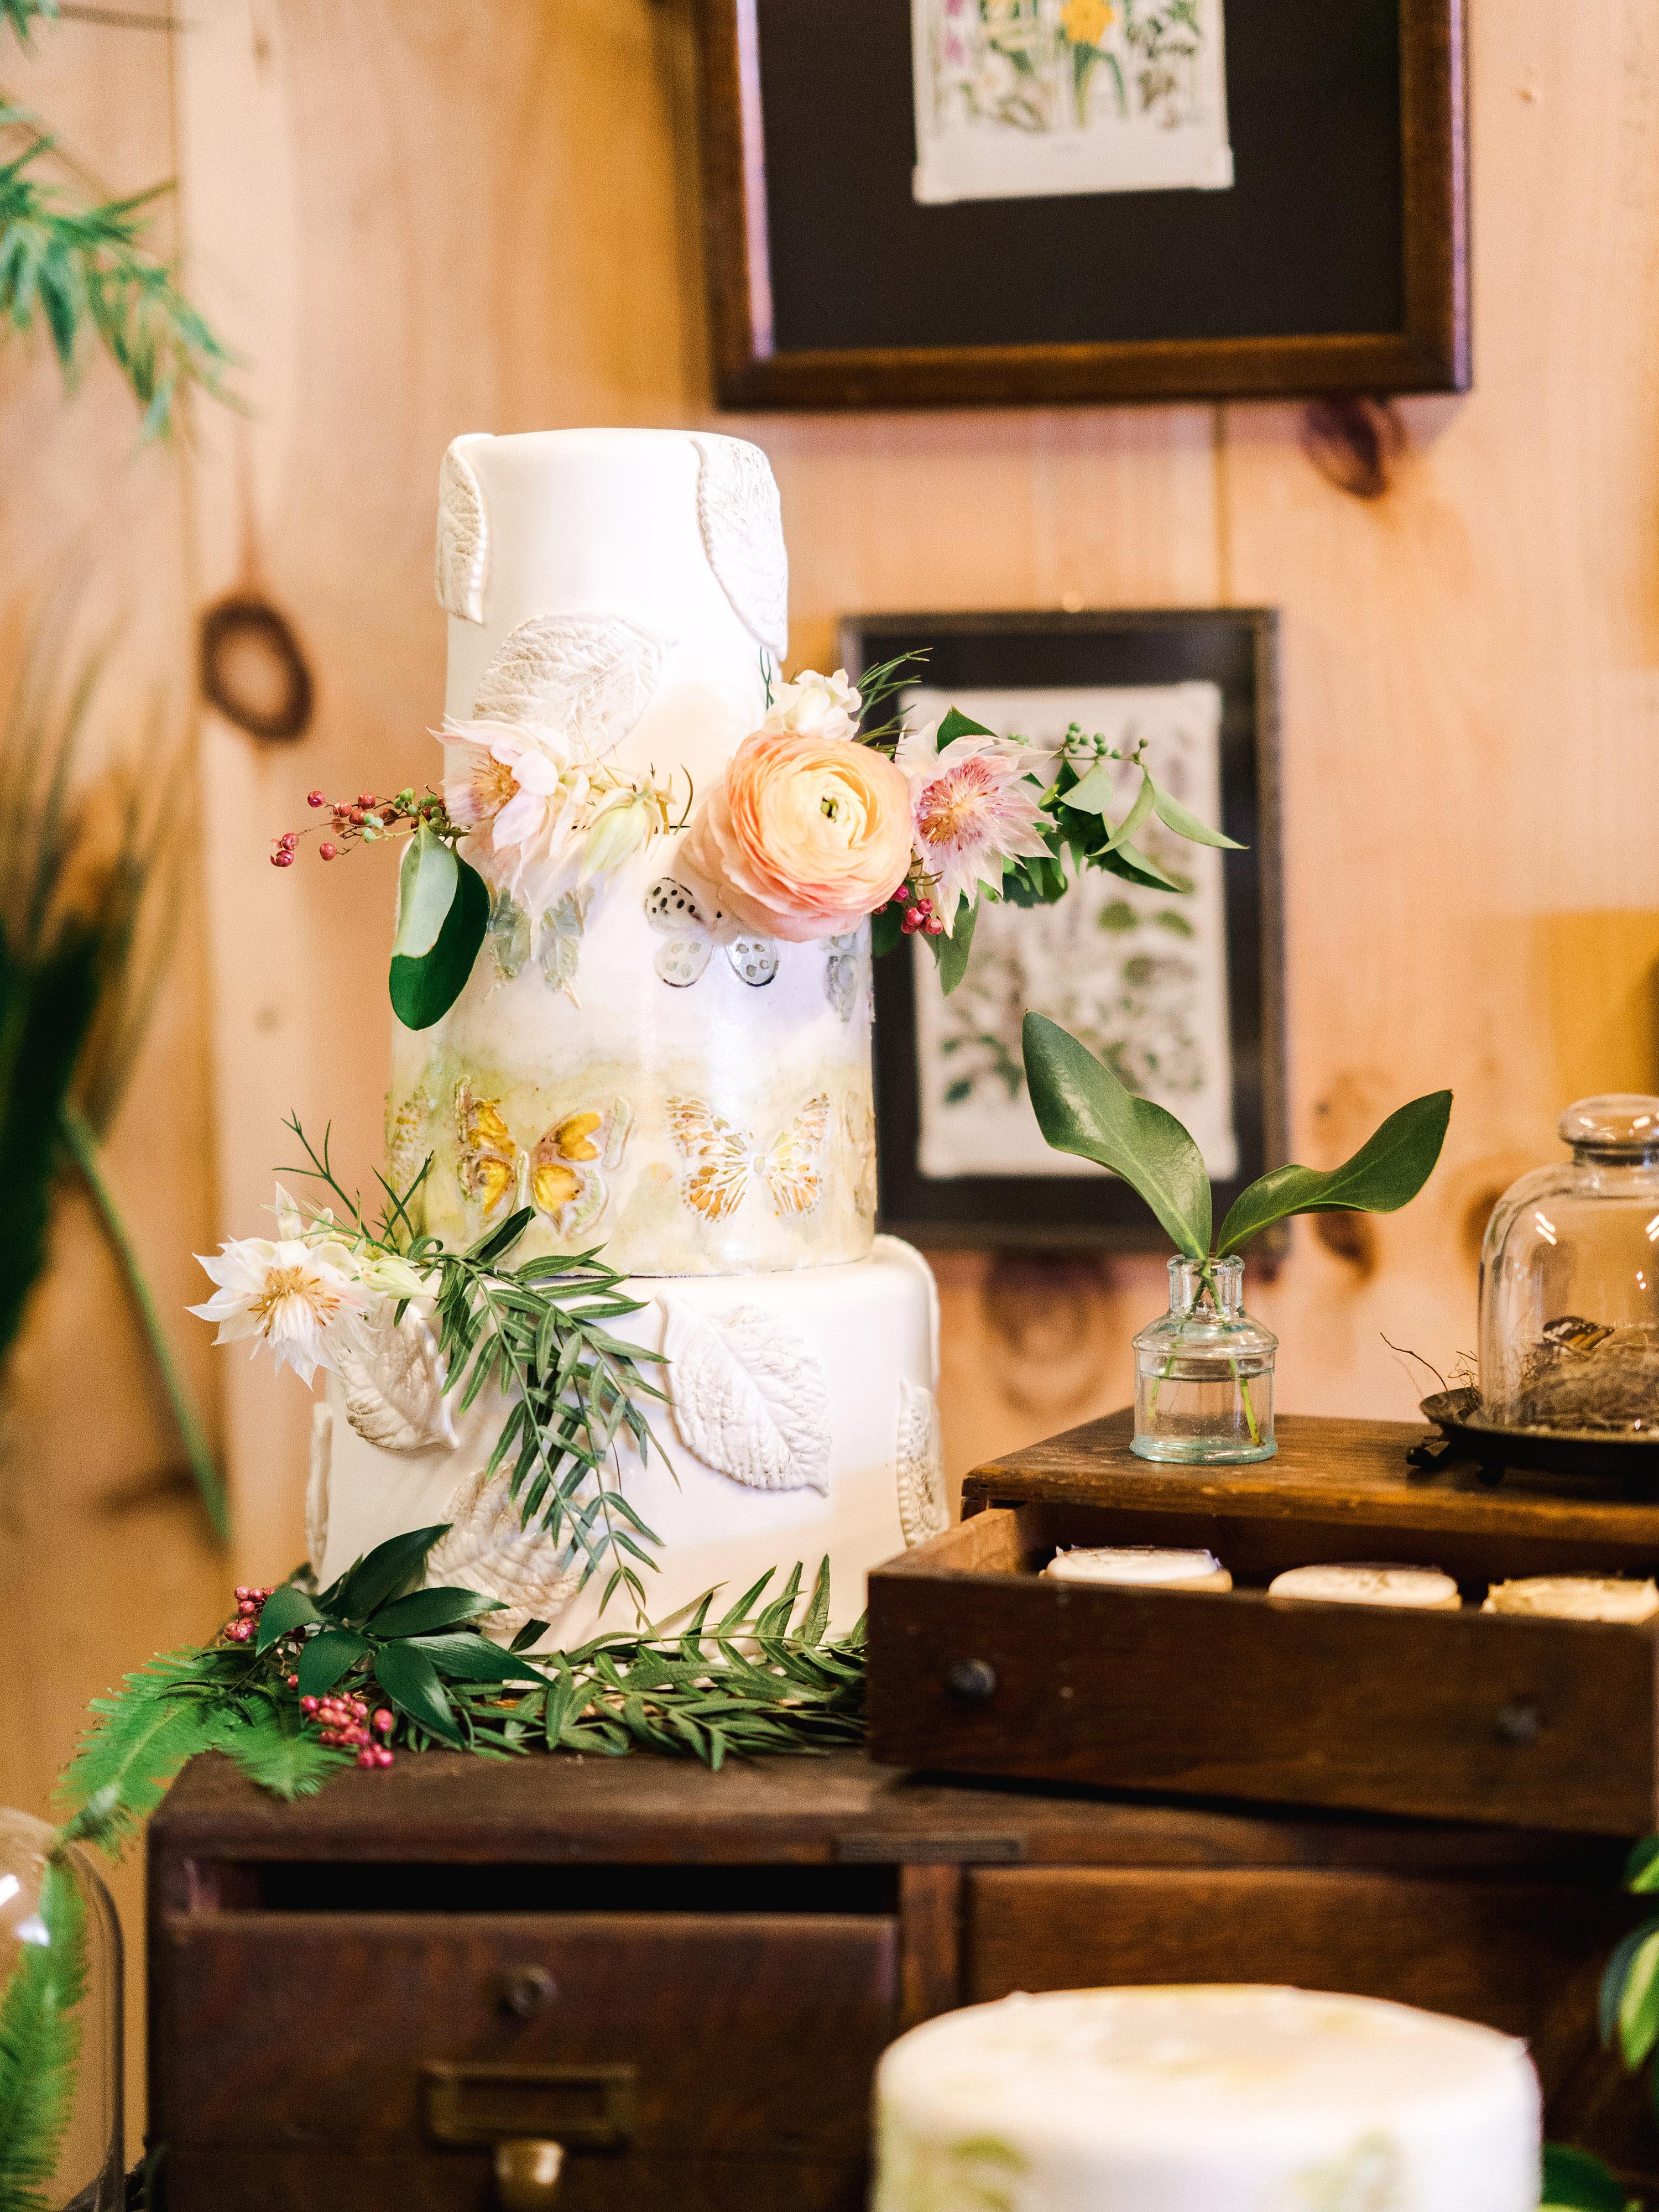 dayane collin wedding cake on wooden display